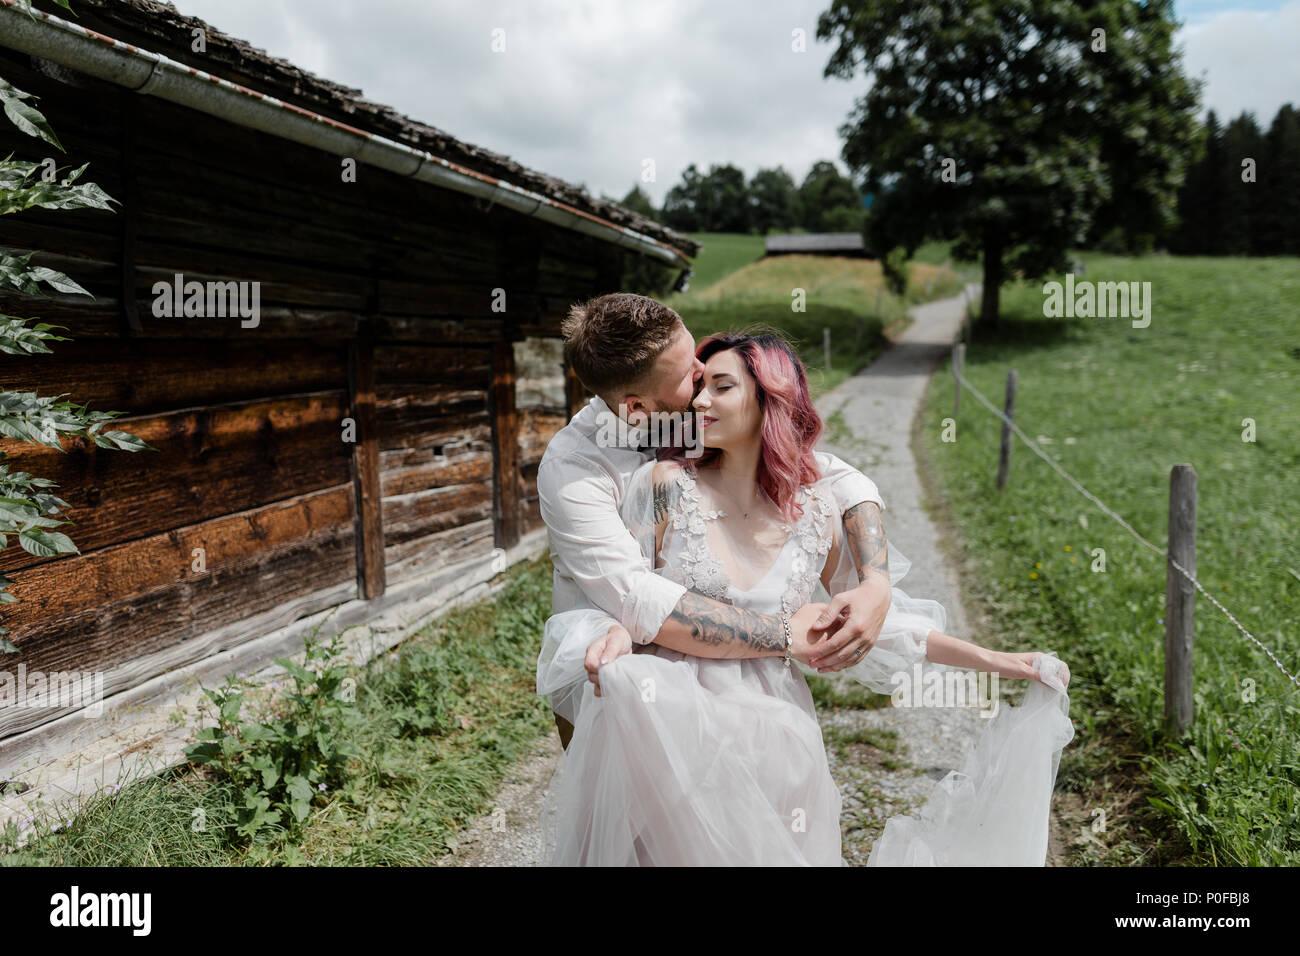 handsome groom kissing and hugging bride in wedding dress, Alps - Stock Image